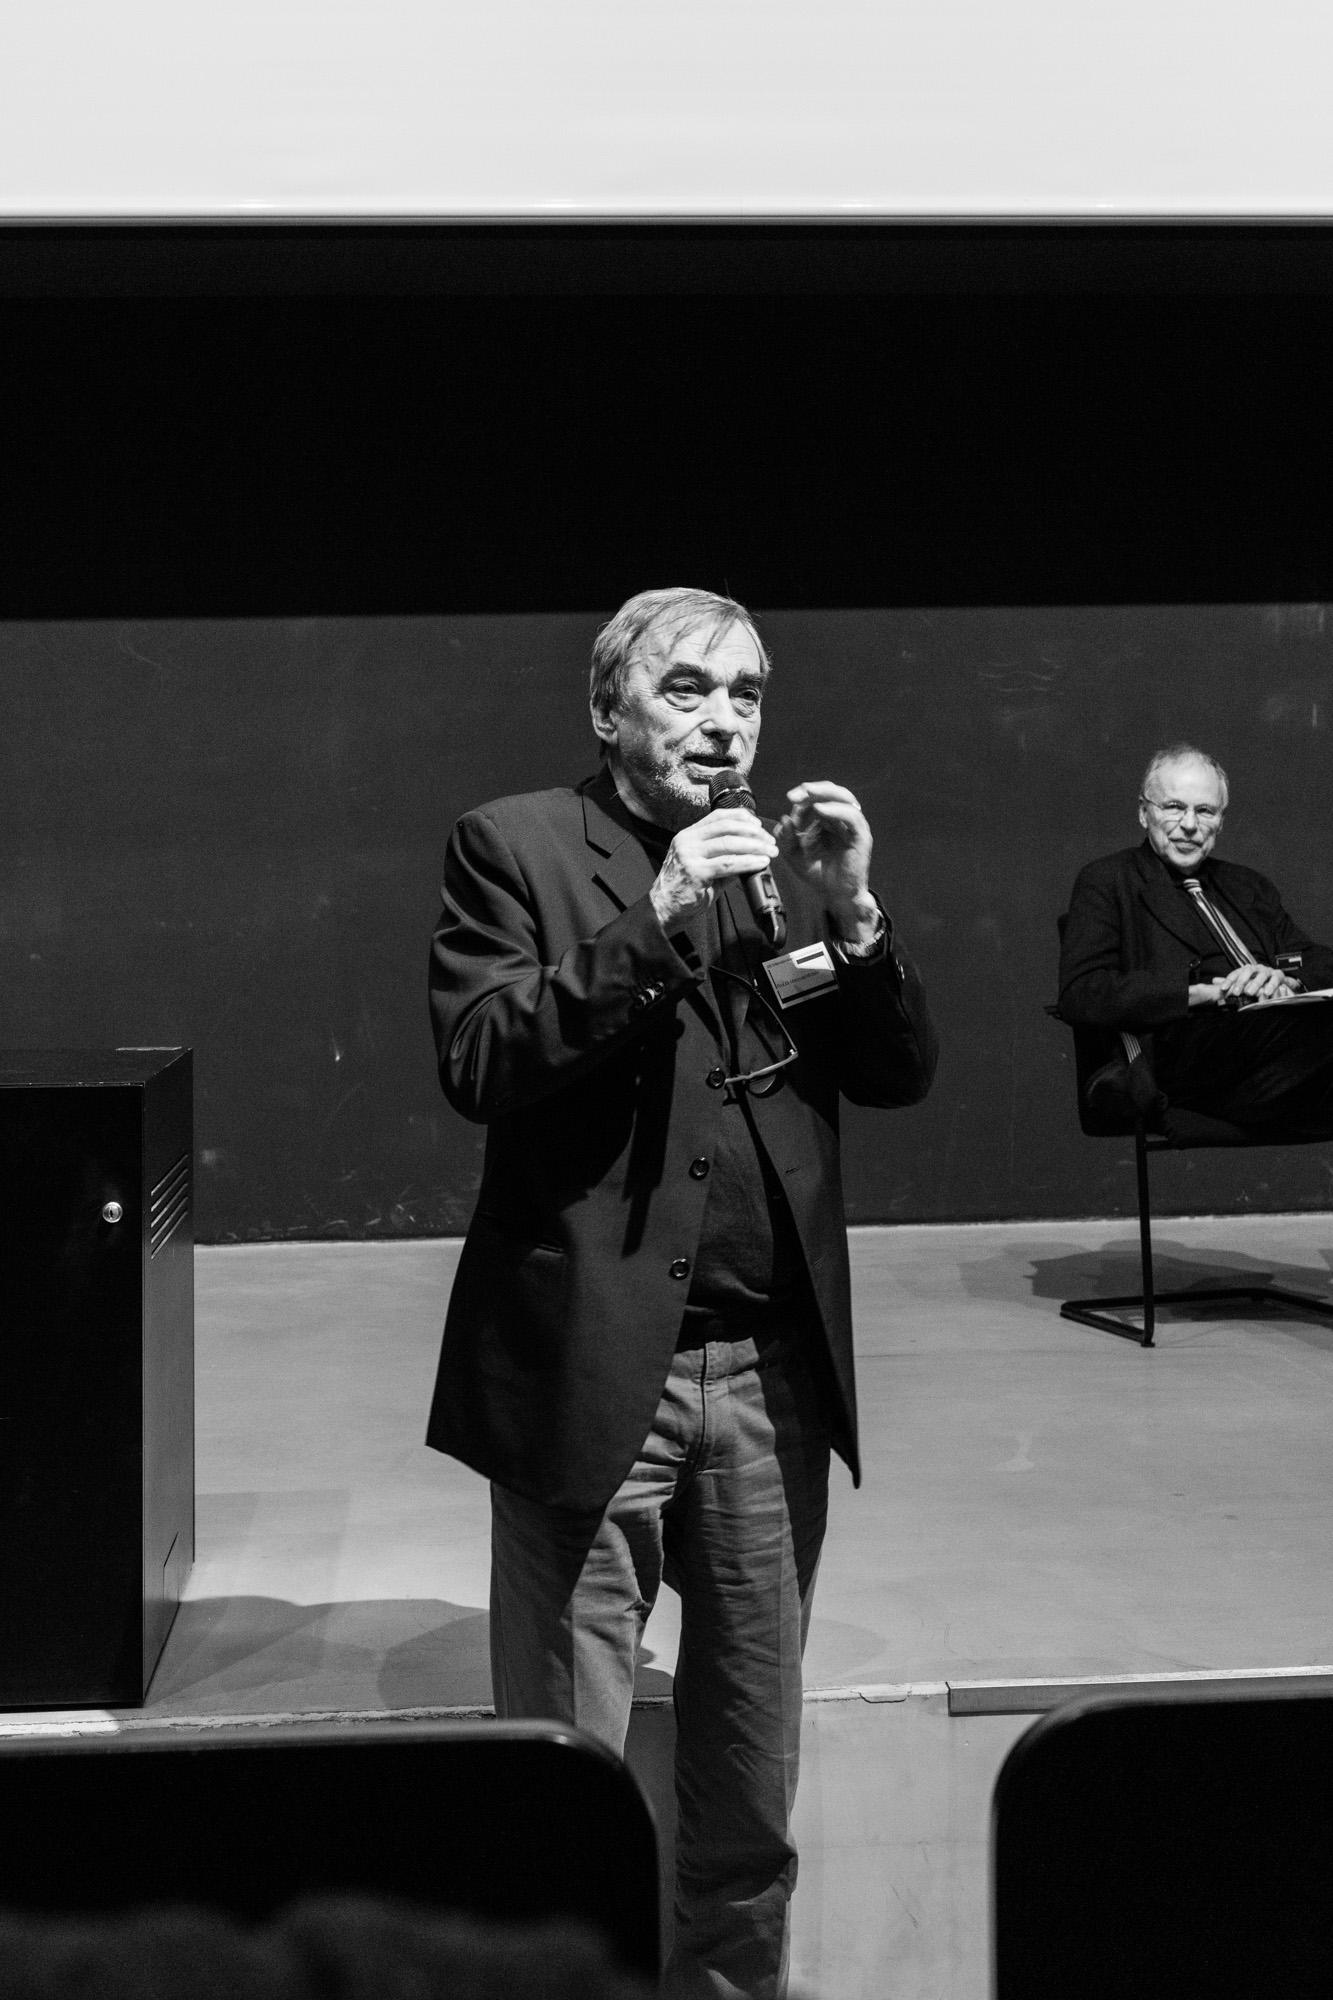 Marco De Michelis im Publikum. Fotografen: Samuel Solazzo, Jannis Uffrecht, Philipp Niemeyer